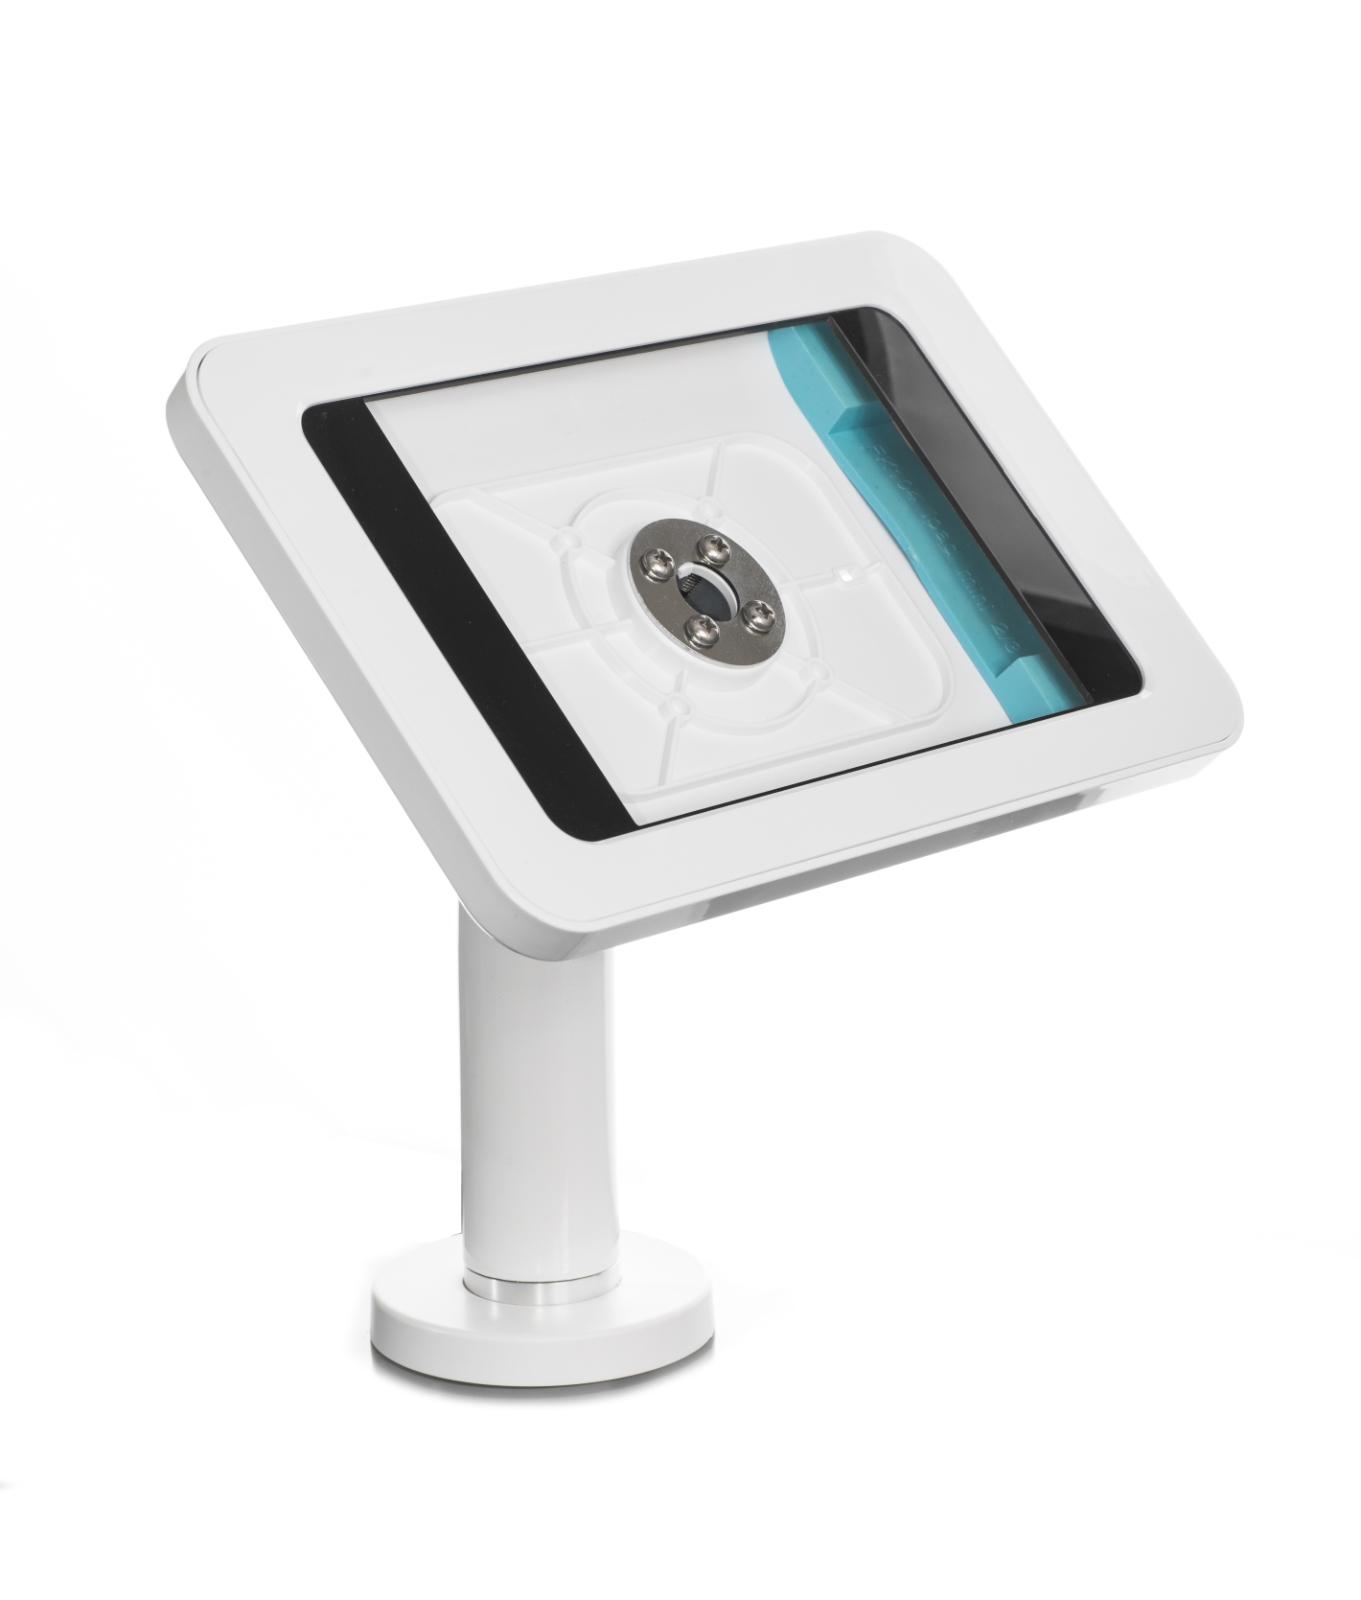 tablet enclosure-4